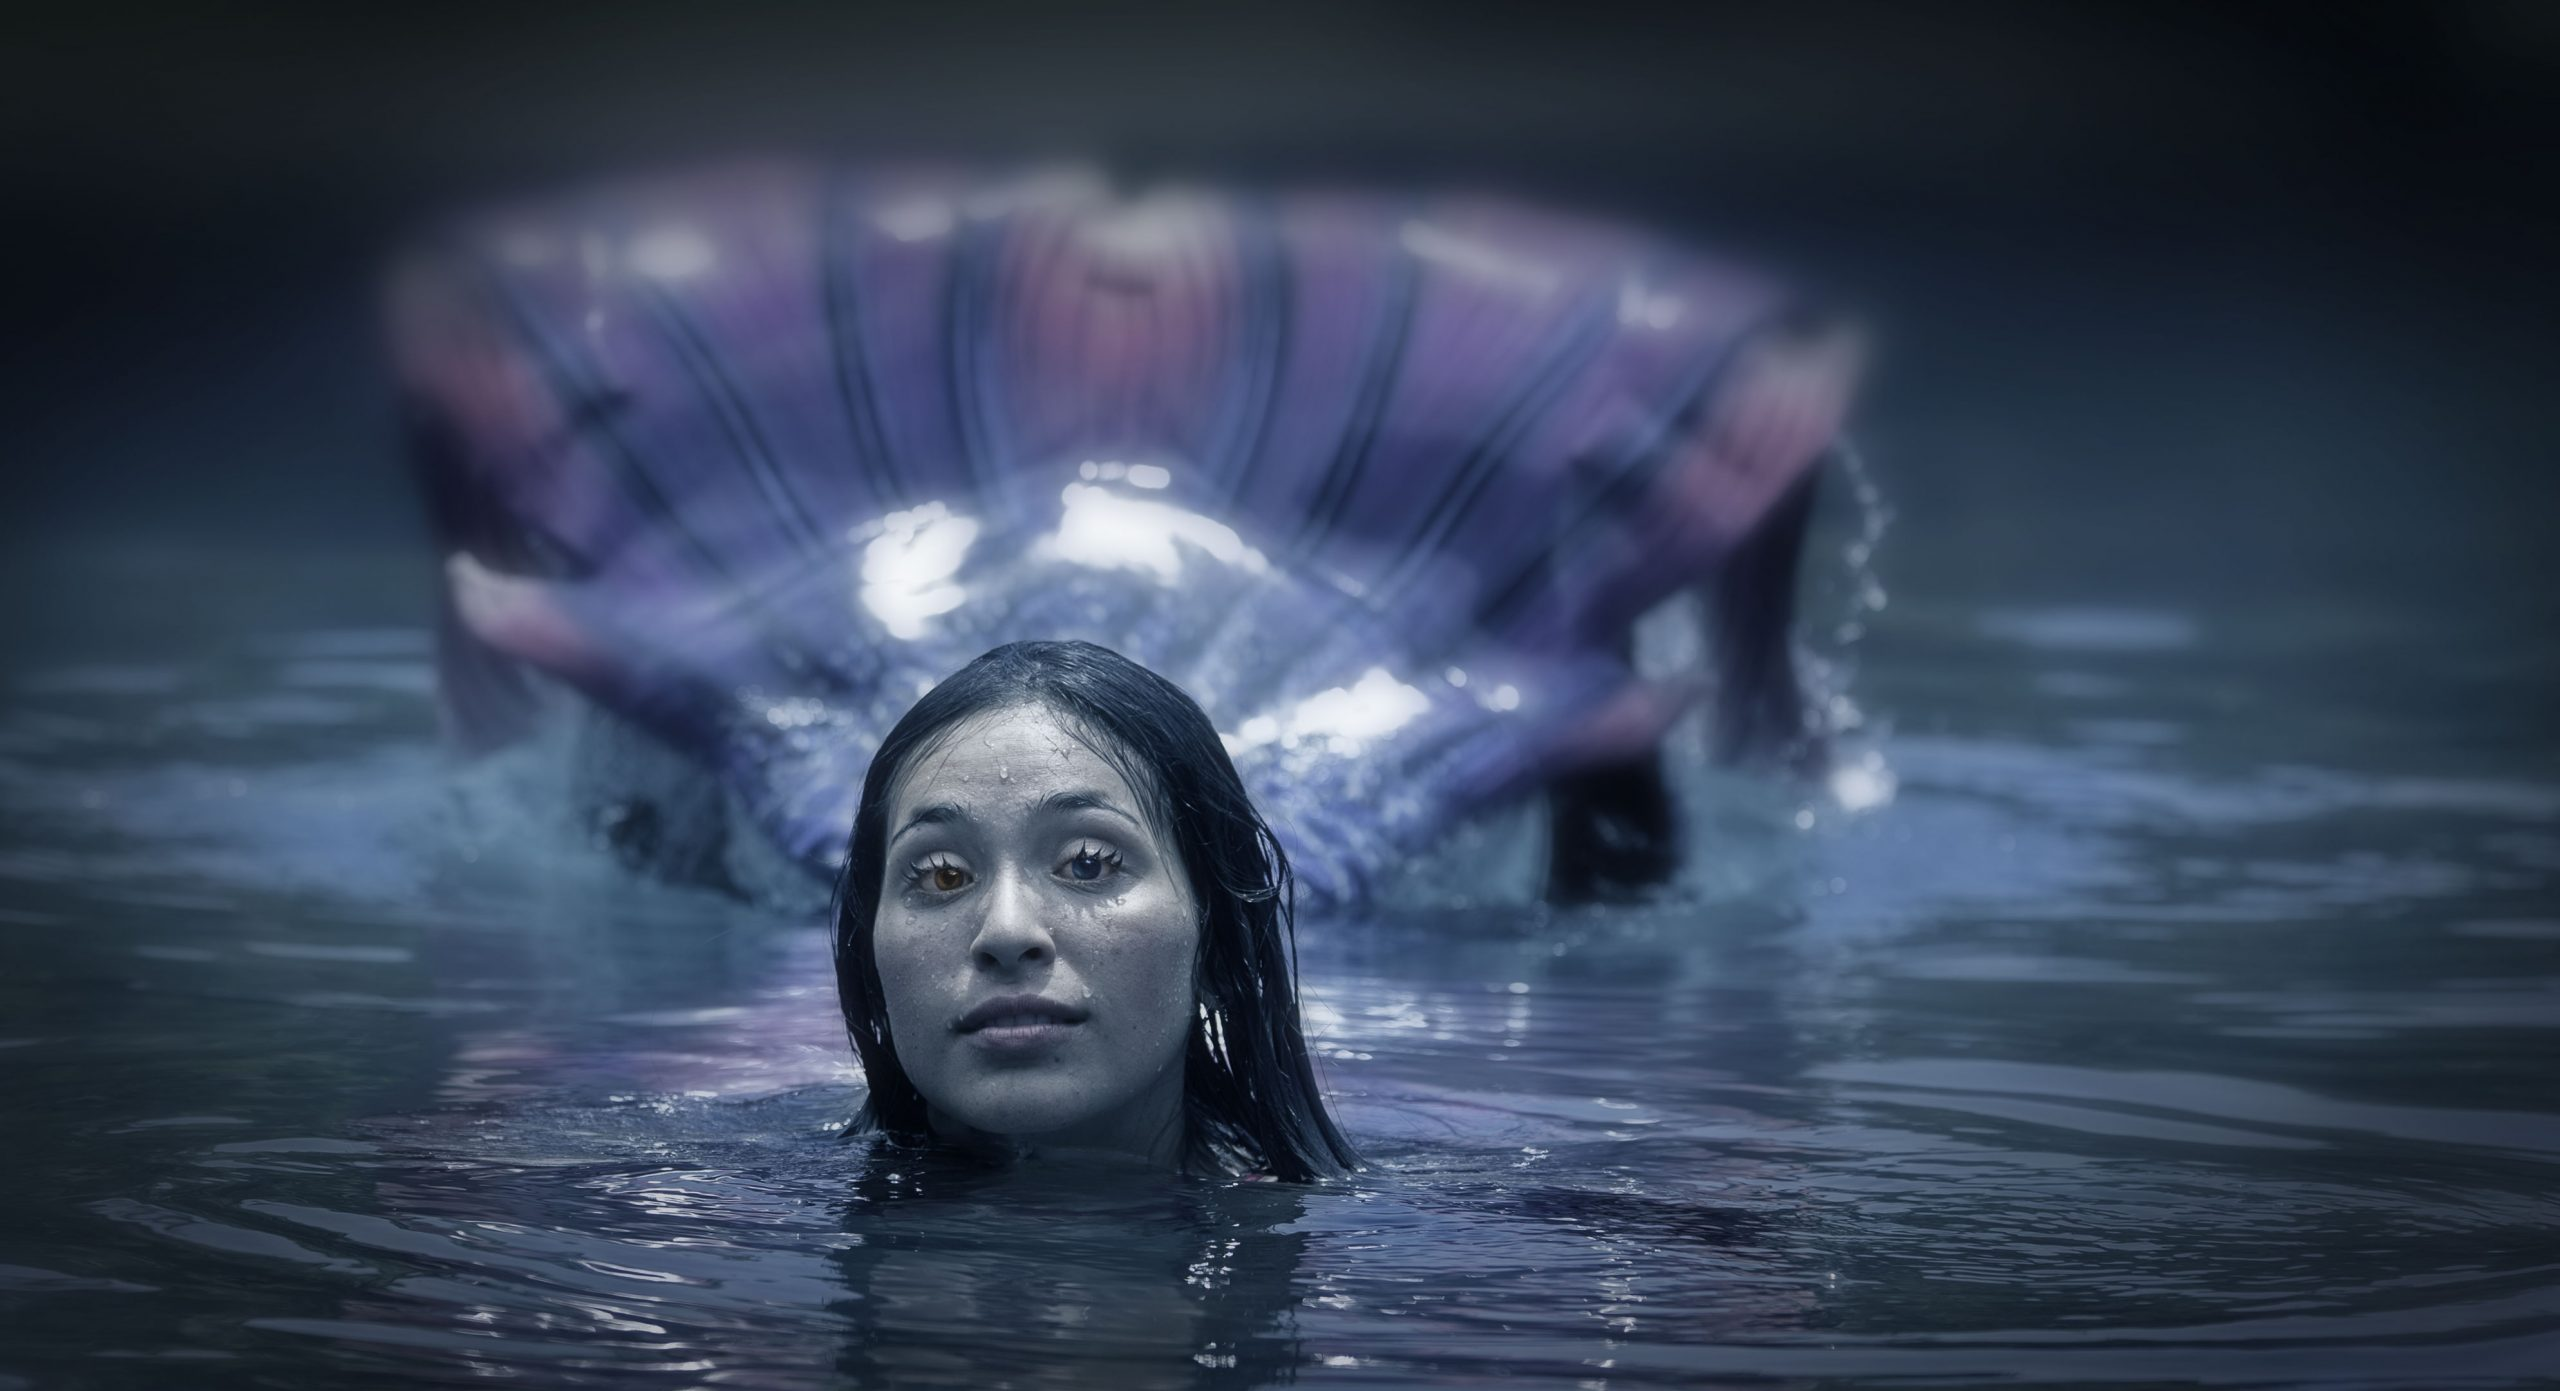 Mermaid coming up above water.